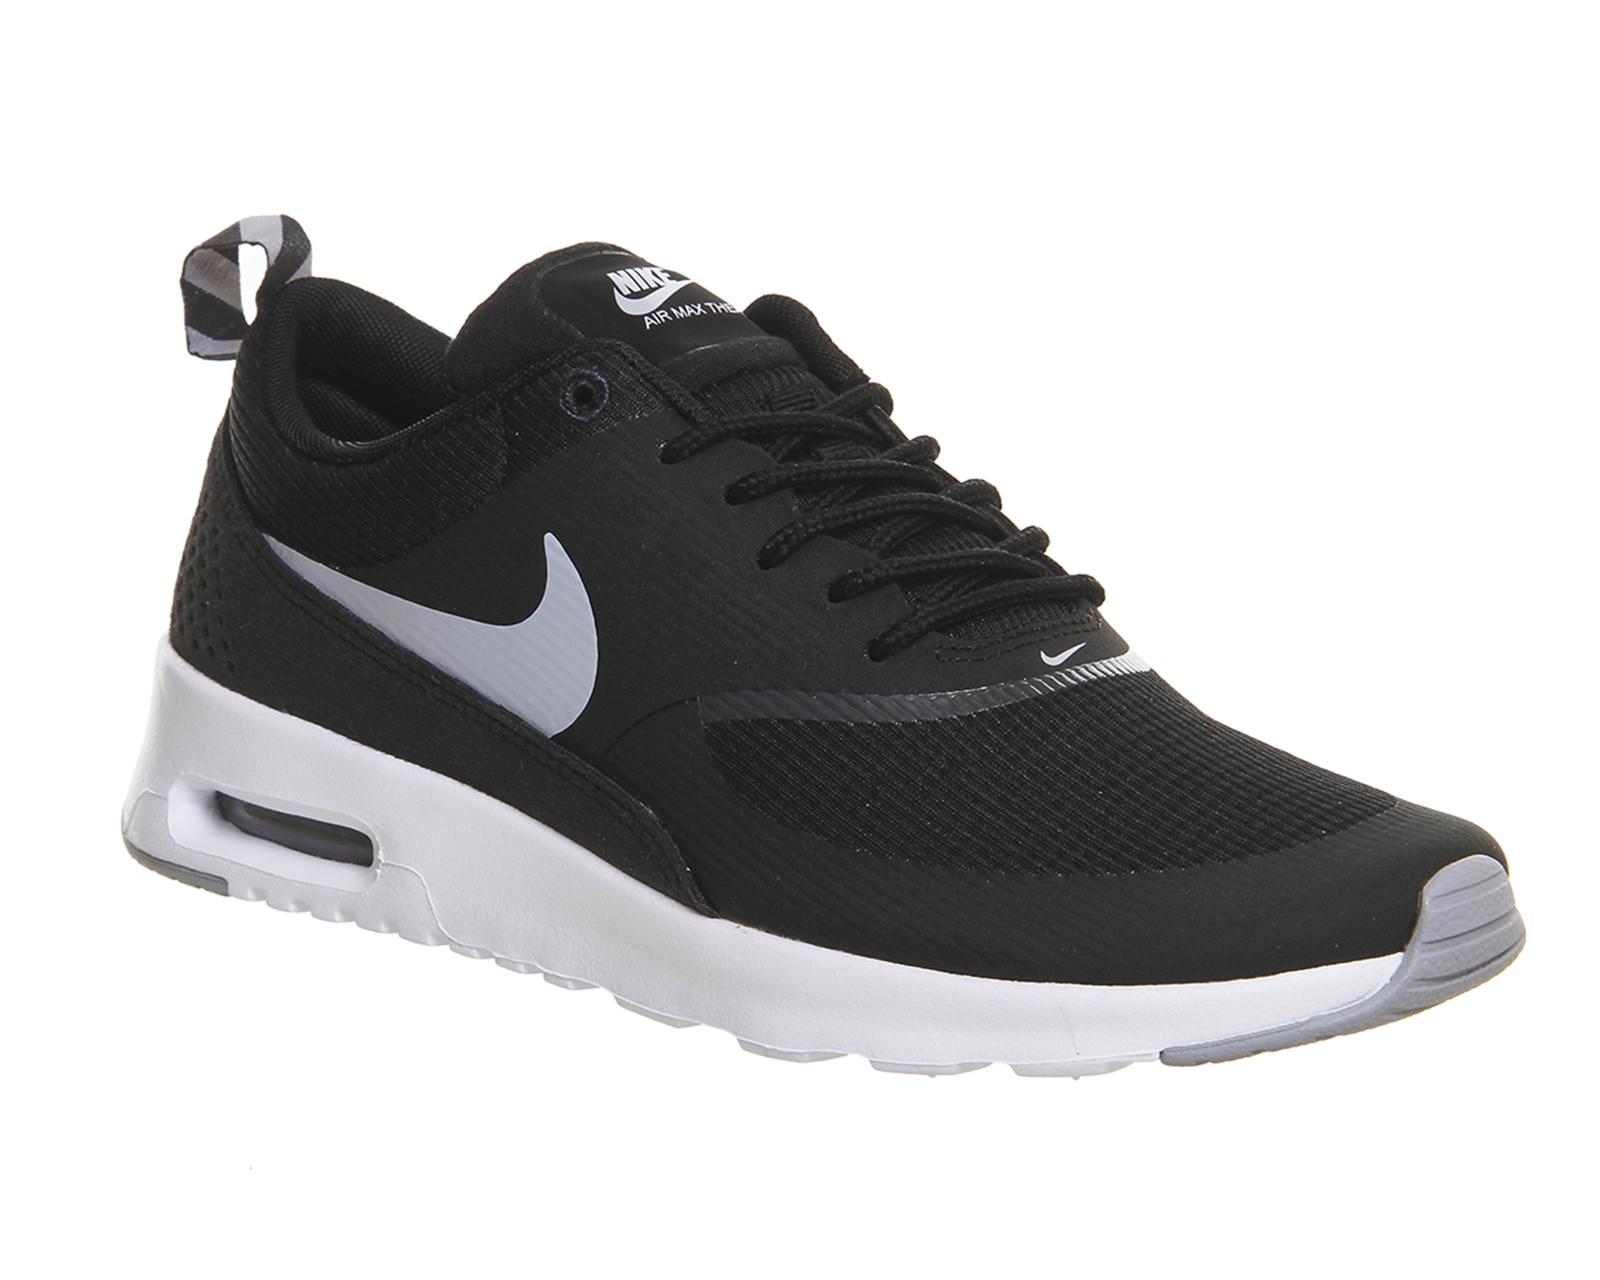 best website ca88b 53f28 Dove Comprare Scarpe Nike Shox Yahoo